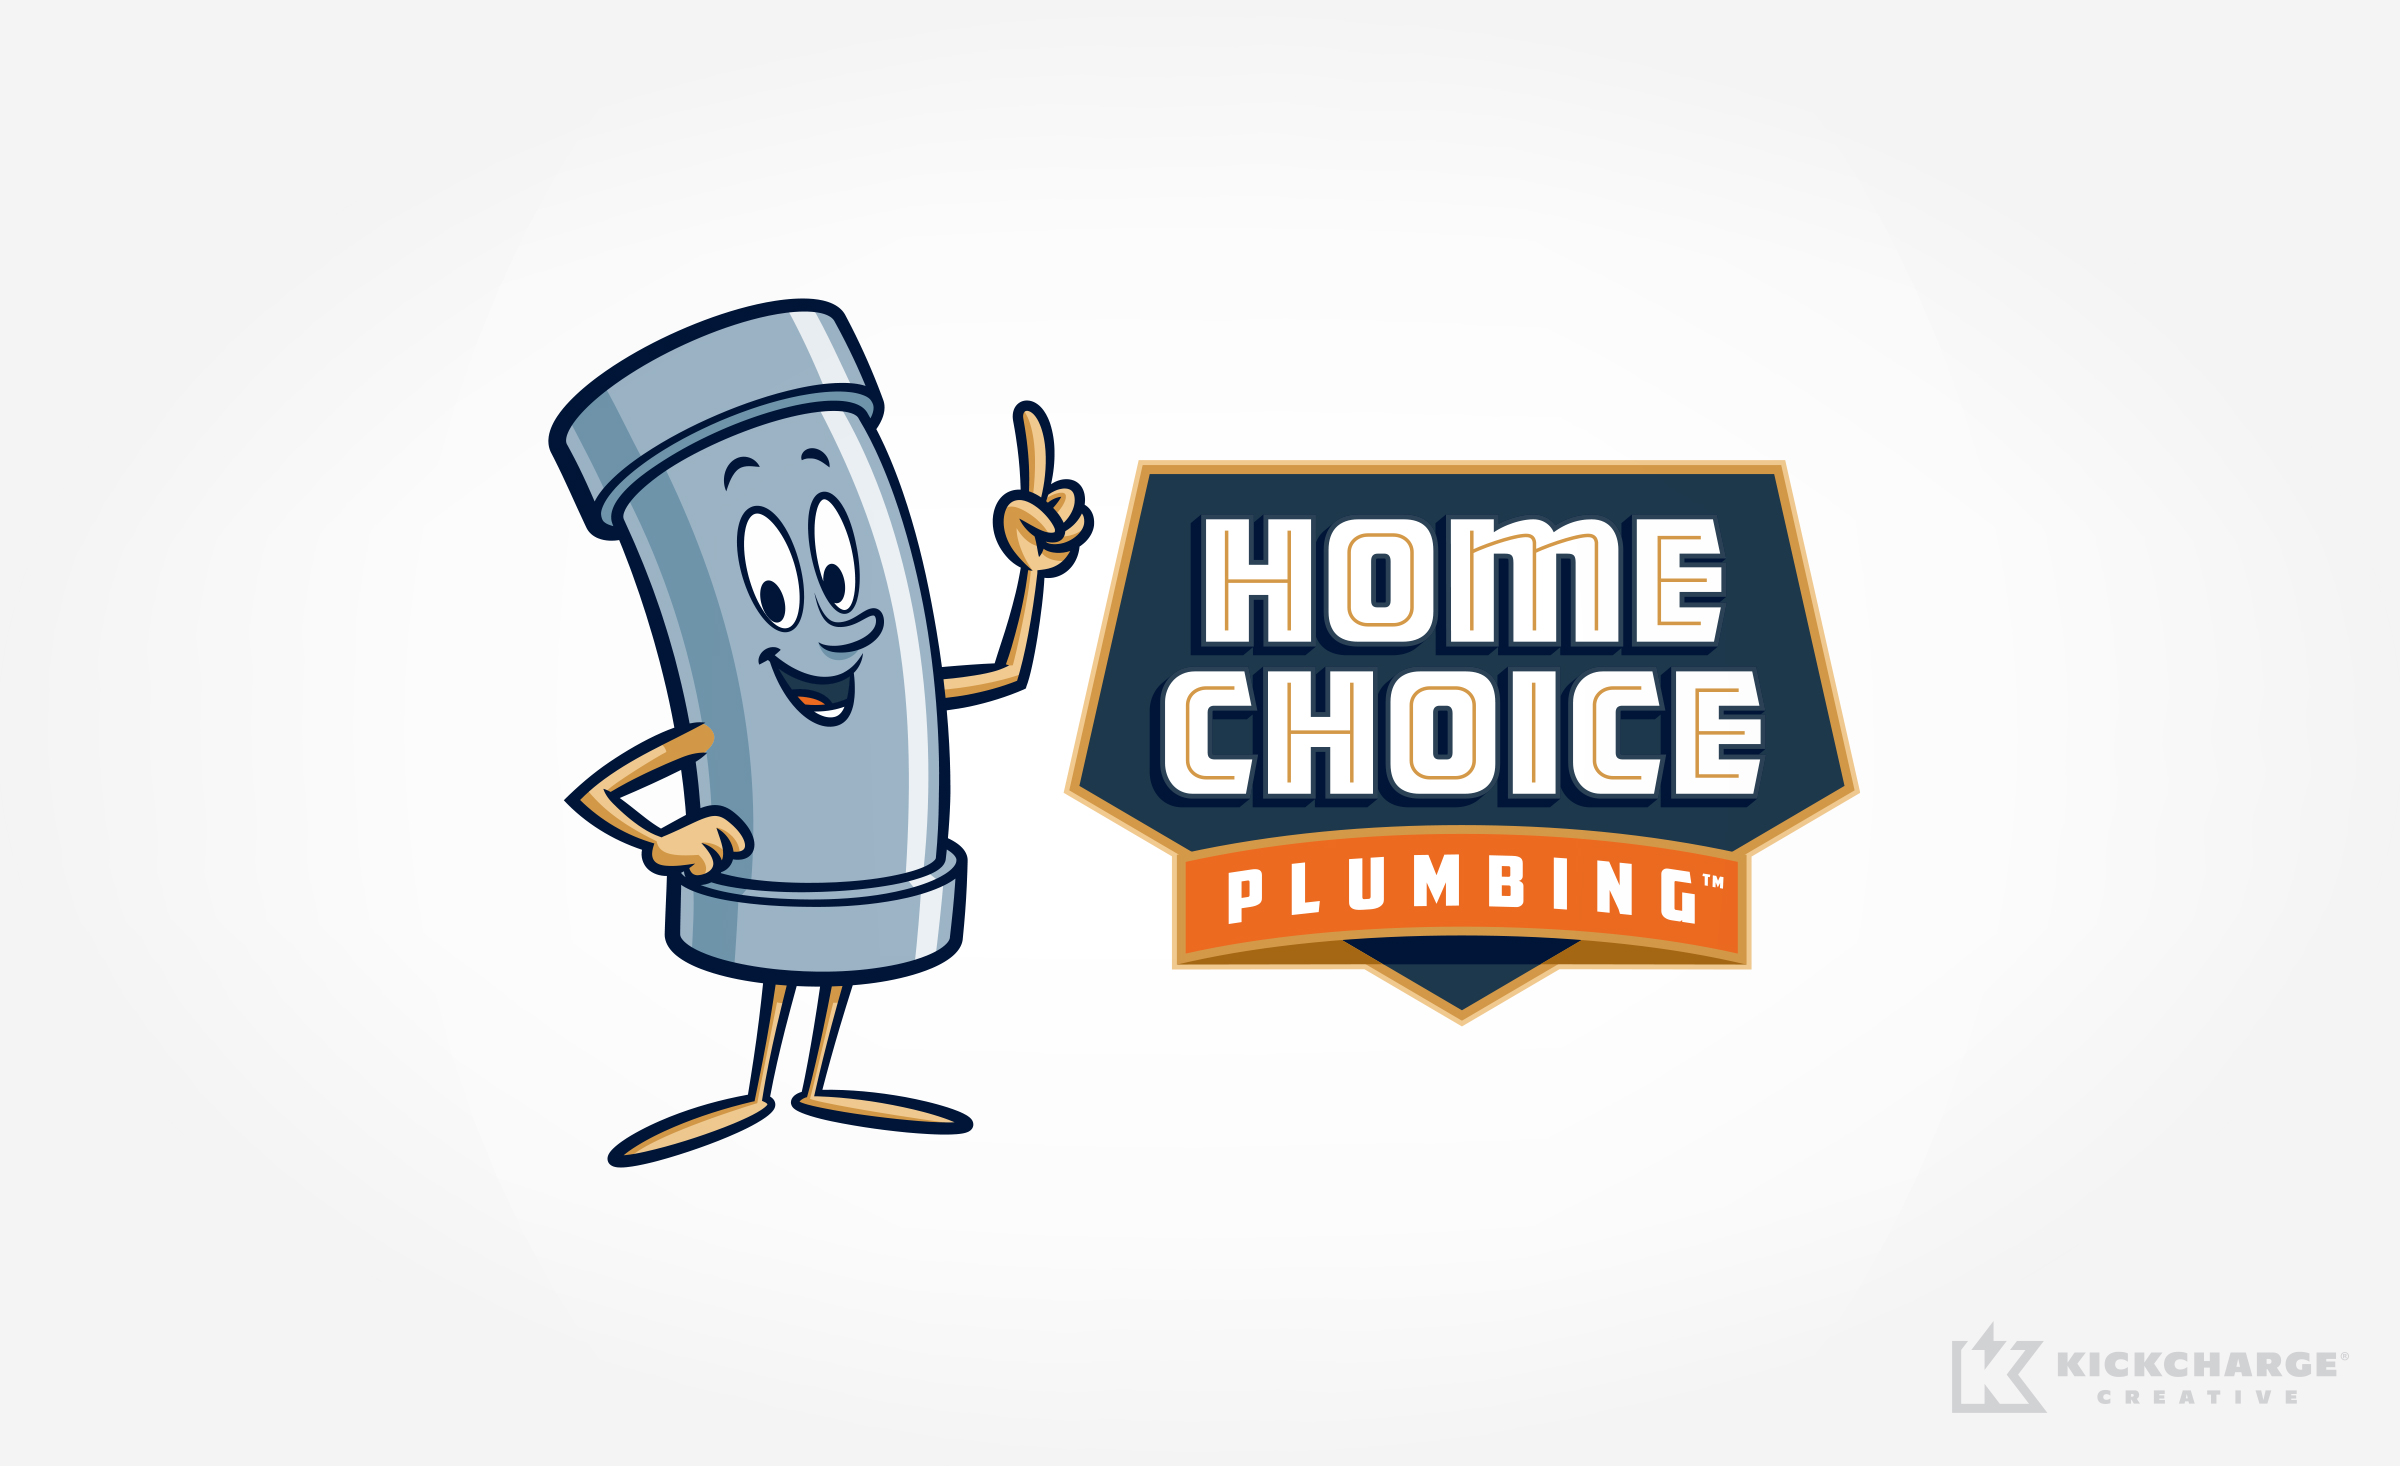 plumbing logo for Home Choice Plumbing